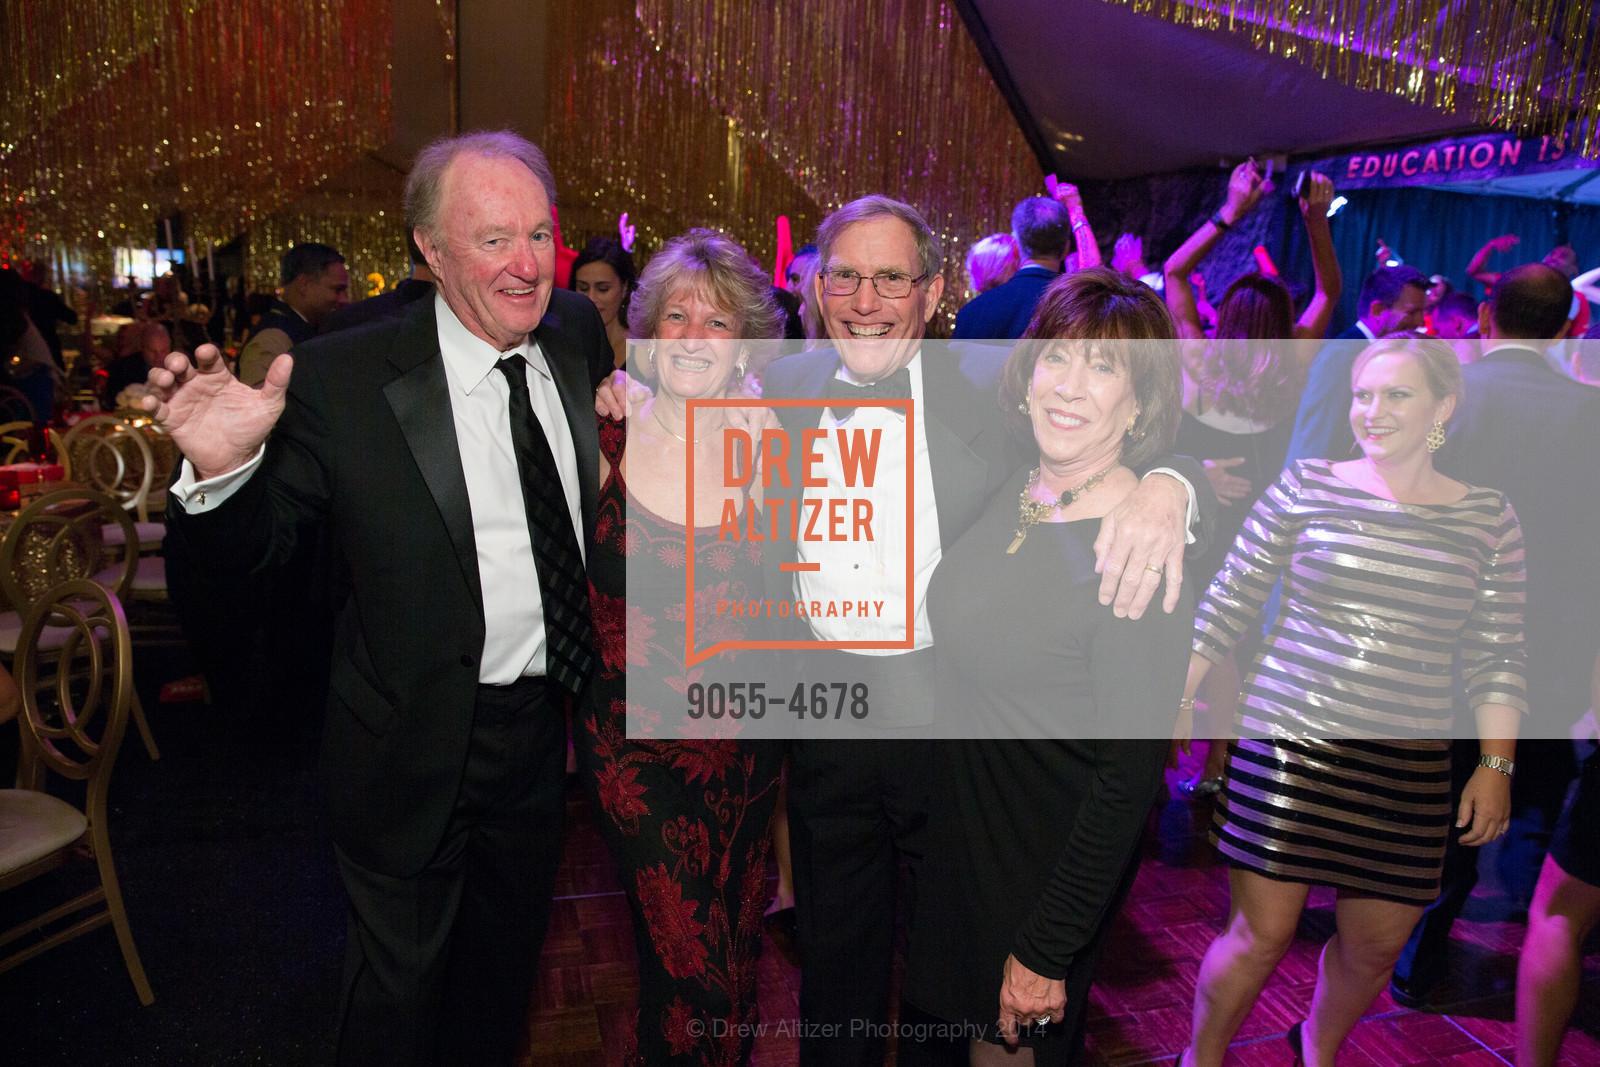 Frank Leavy, Terry O'Brien, Karen Curtis, Richard Curtis, Photo #9055-4678